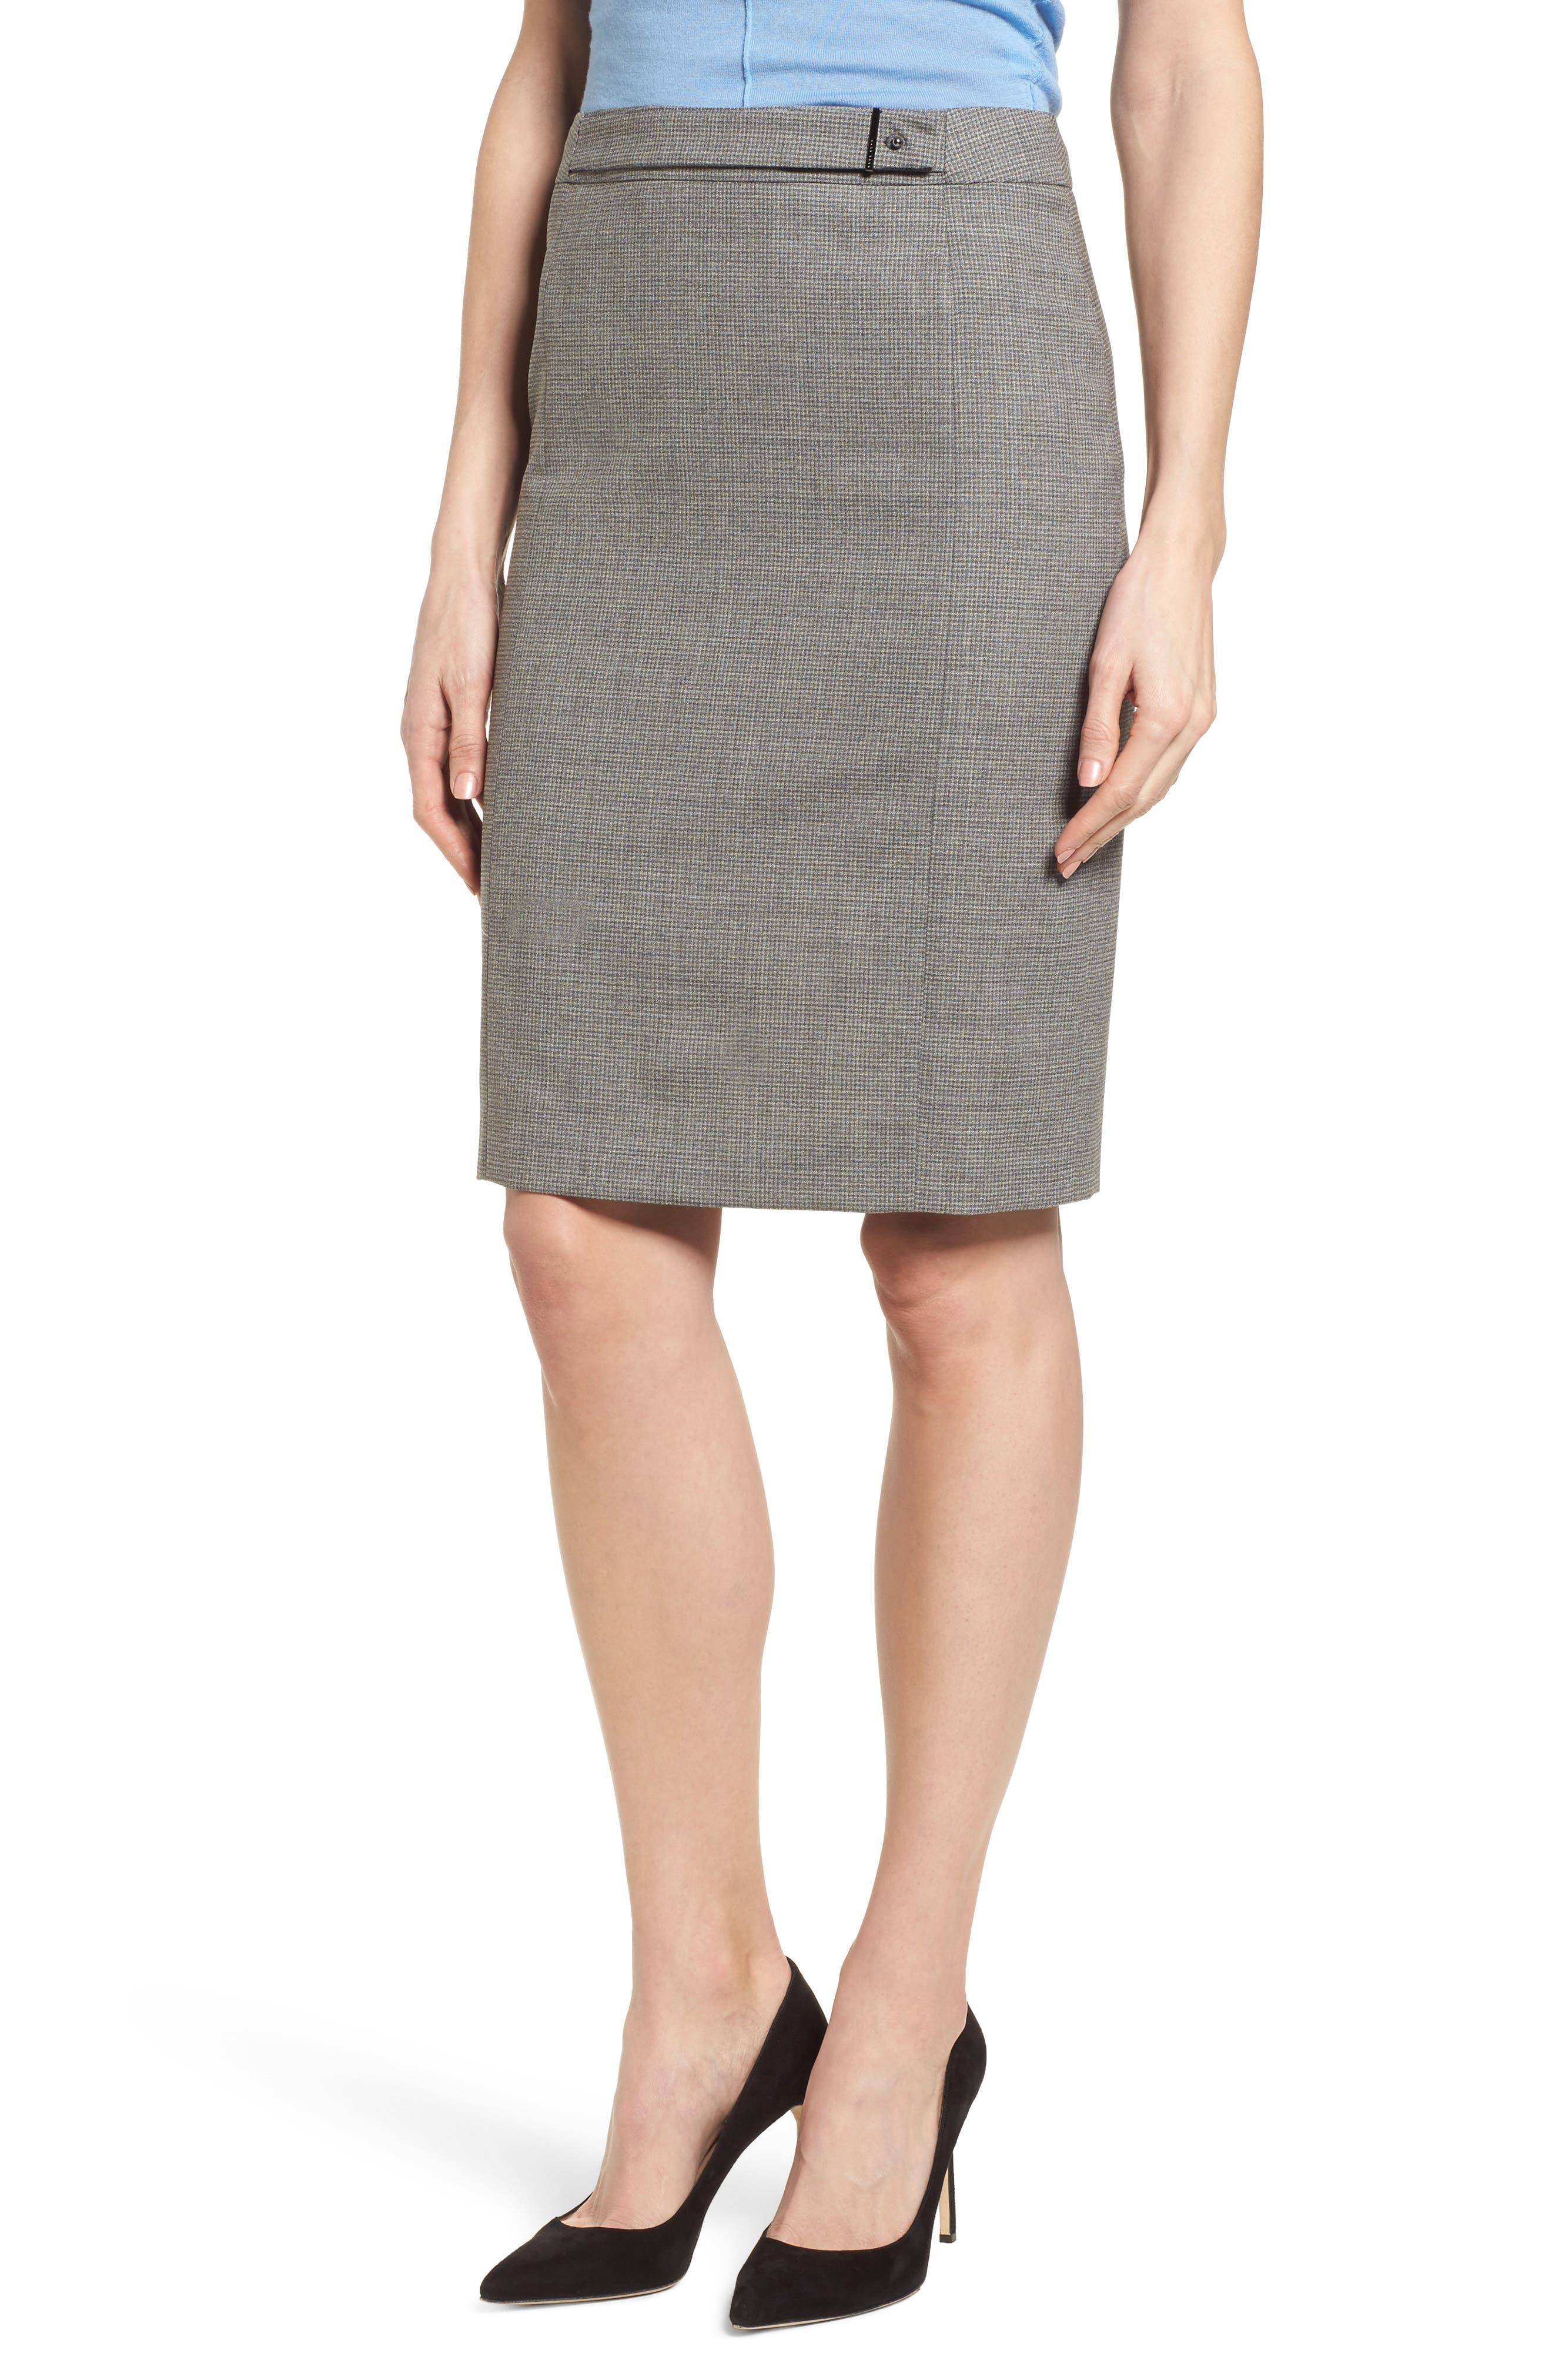 Vewisa Check Wool Suit Skirt,                             Main thumbnail 1, color,                             Cozy Grey Melange Fantasy